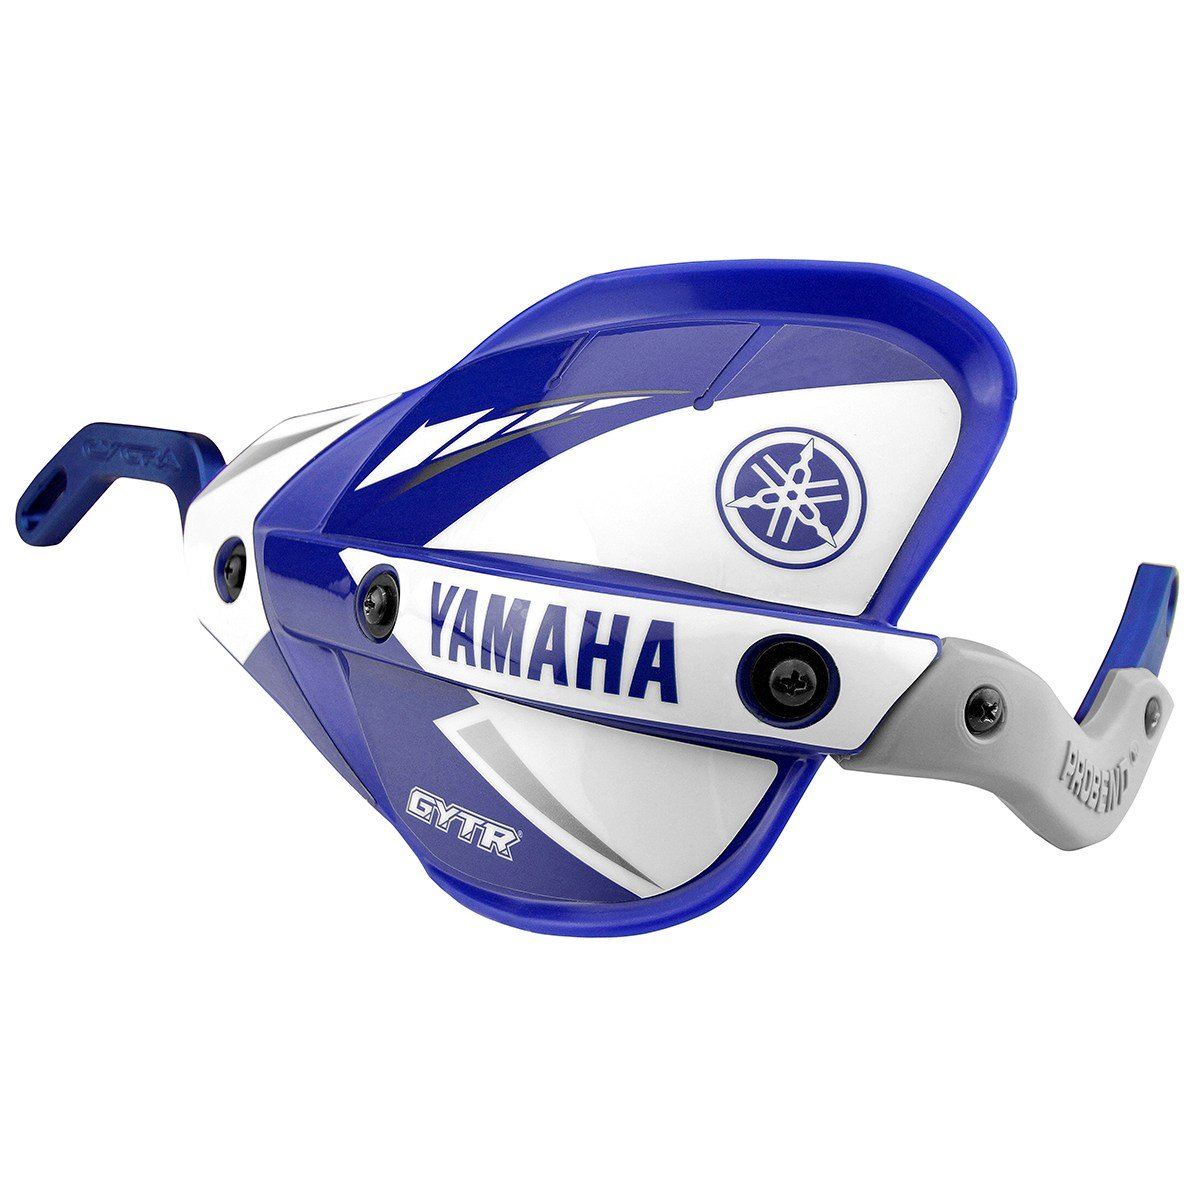 Genuine Yamaha By Cycra Factory ProBend CRM Rack Pack Handguards DBYACC563470 Blue